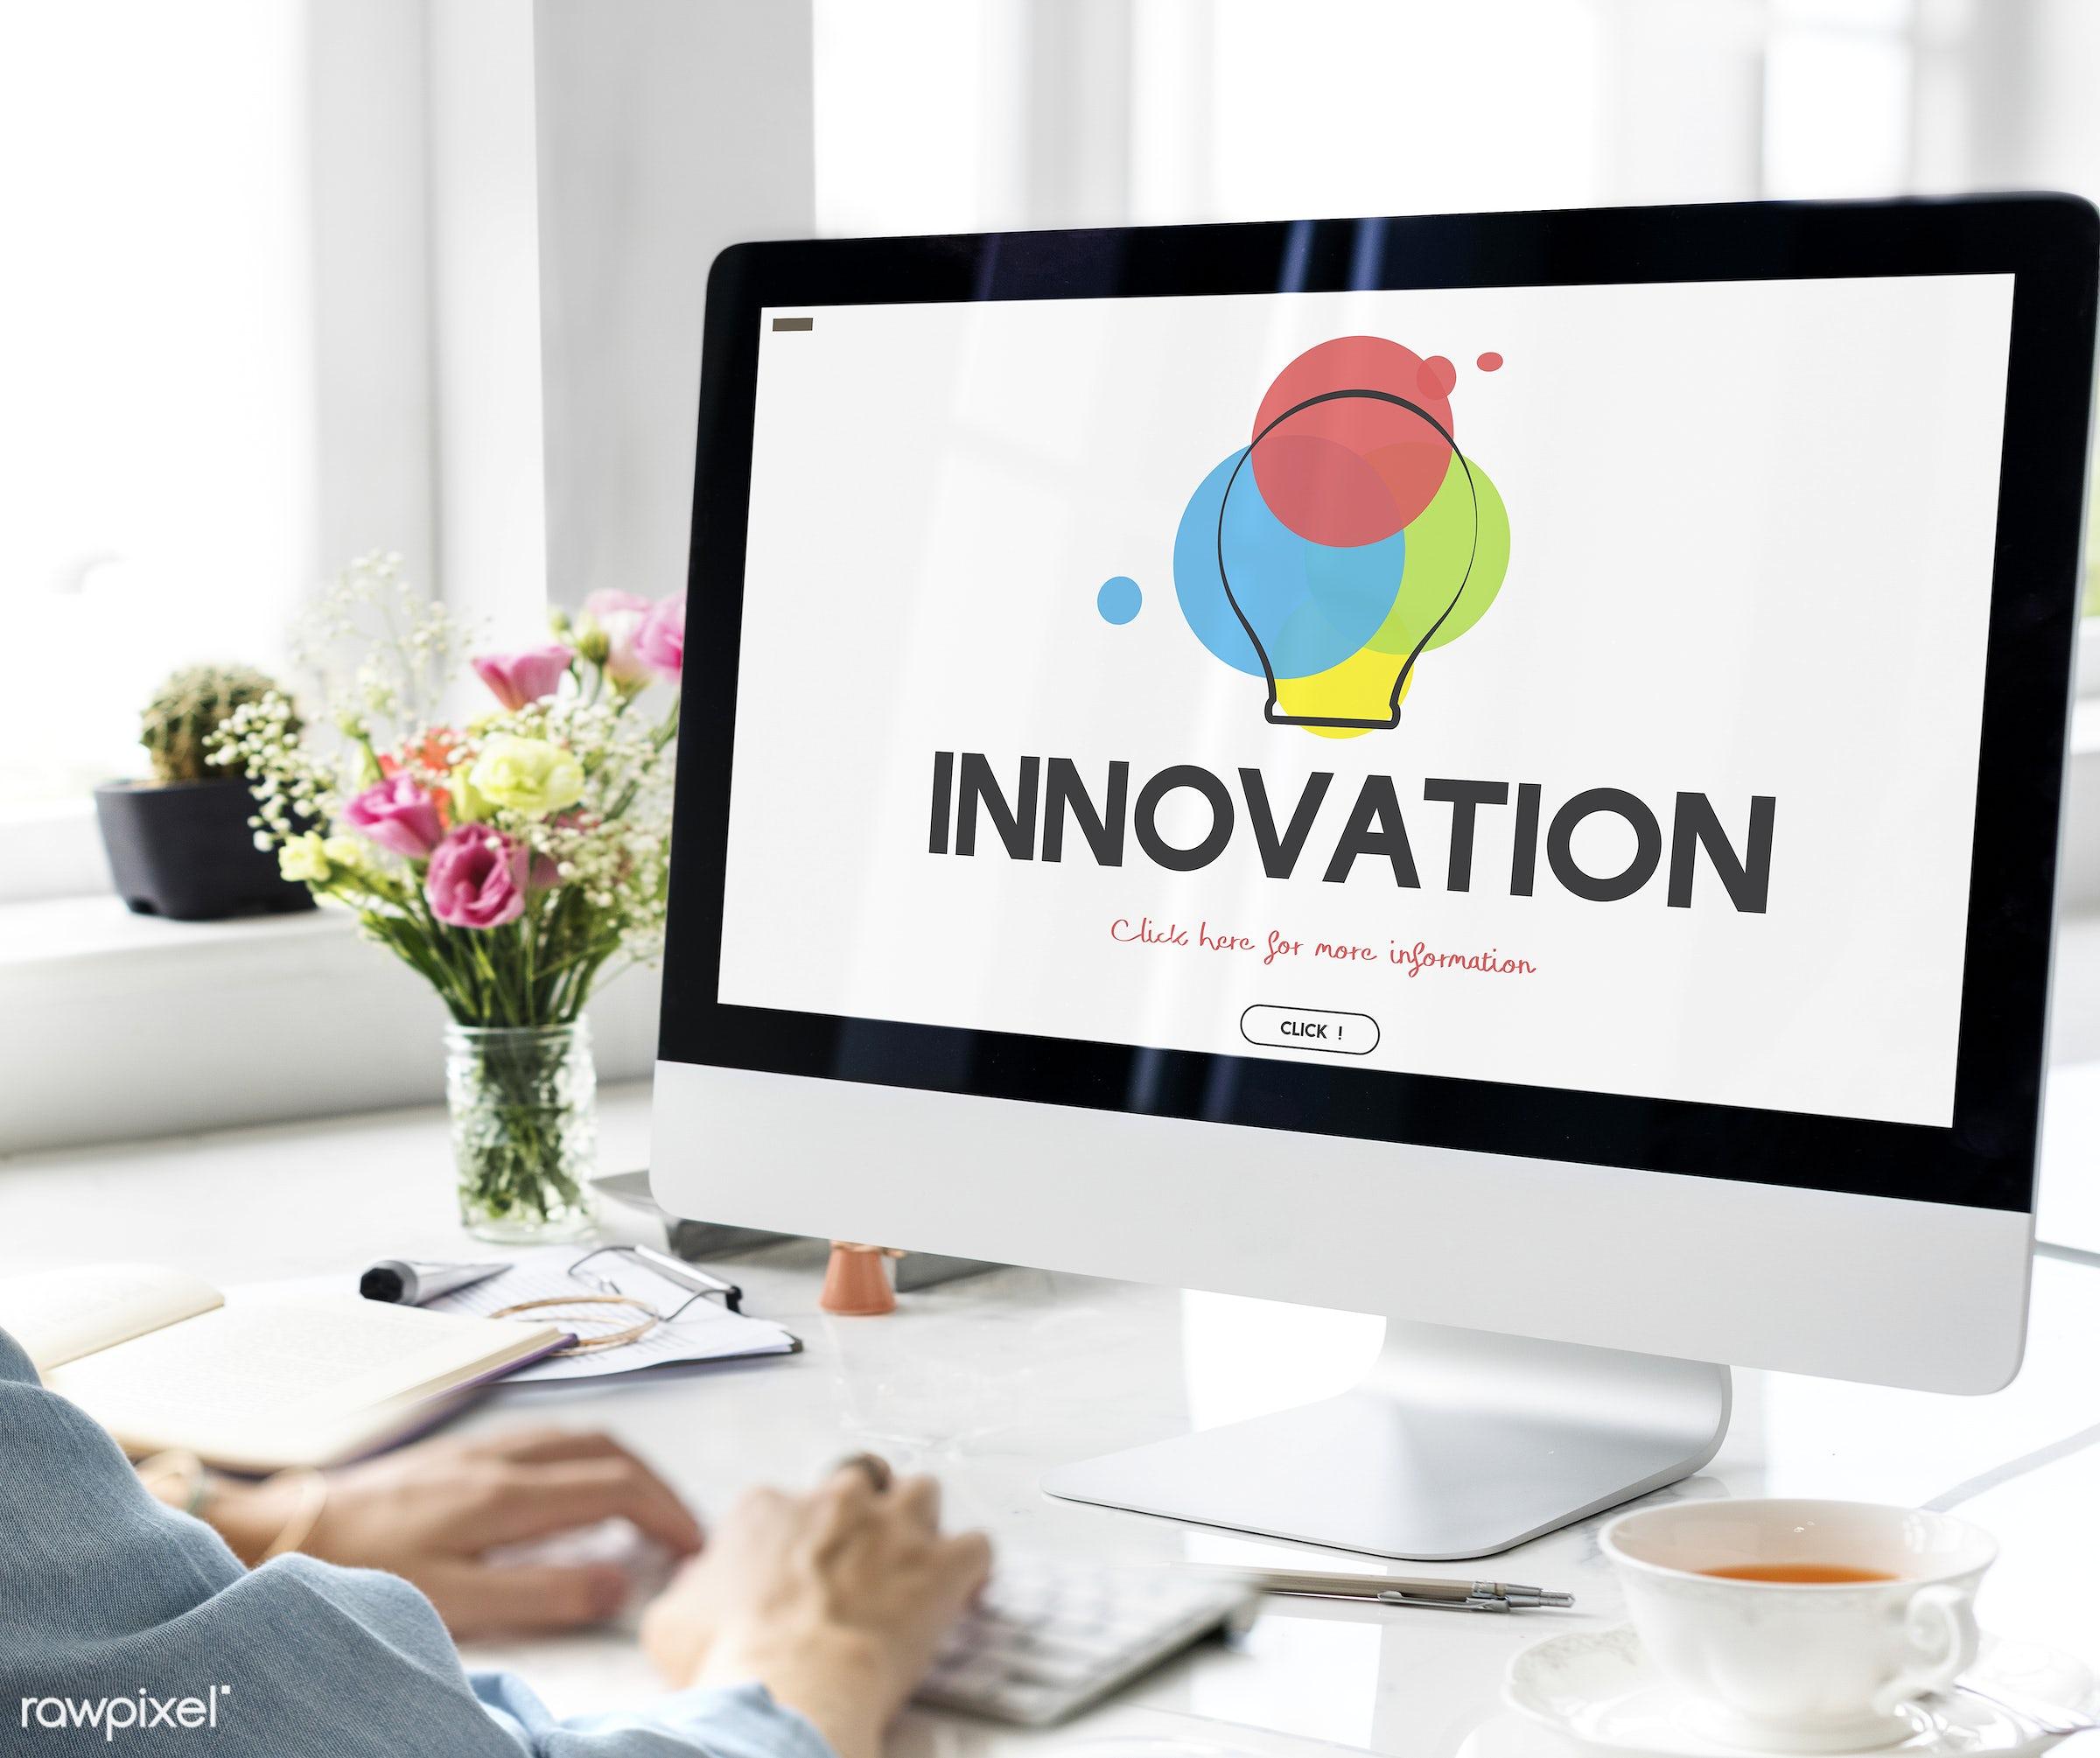 communication, computer, connection, design, device, digital, innovation, internet, leisure, media, network, social media,...